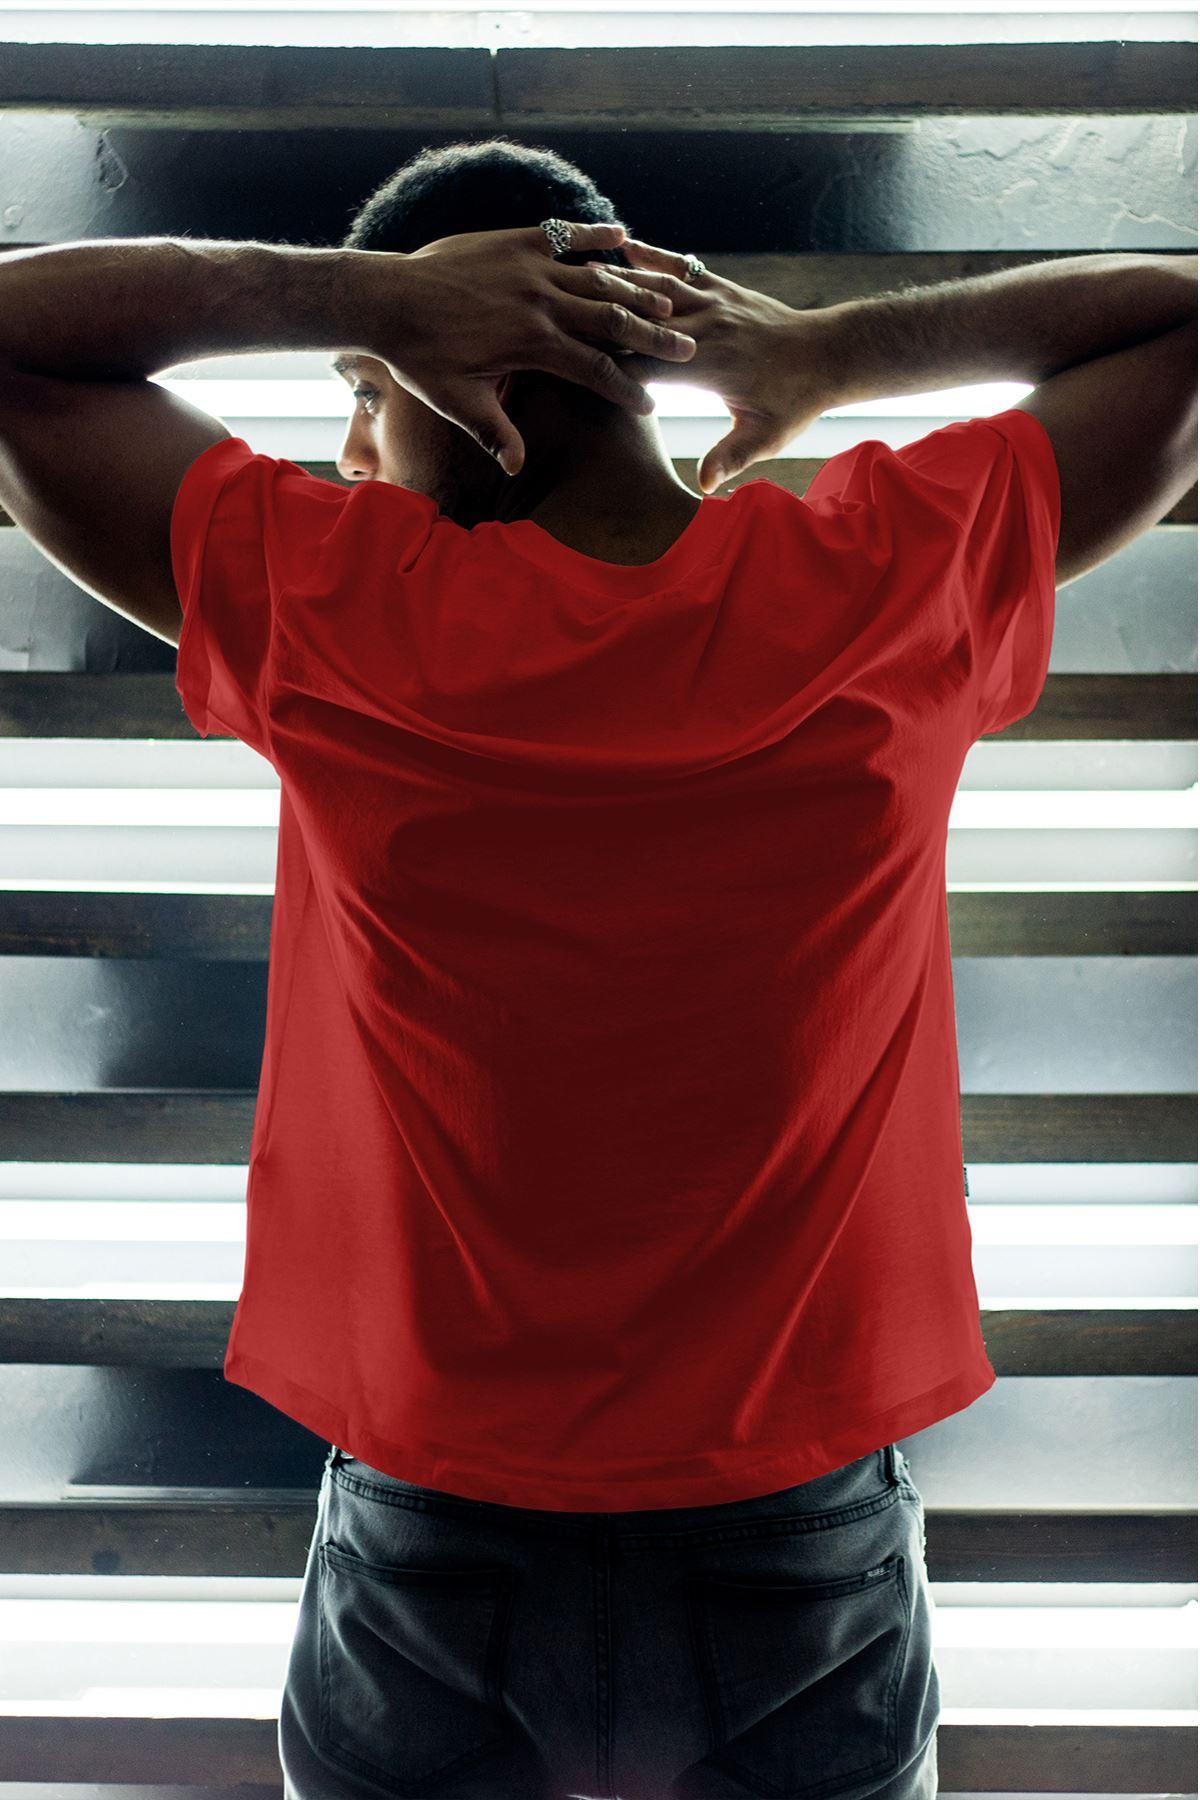 Boston Celtics 33 Kırmızı Erkek Oversize Tshirt - Tişört